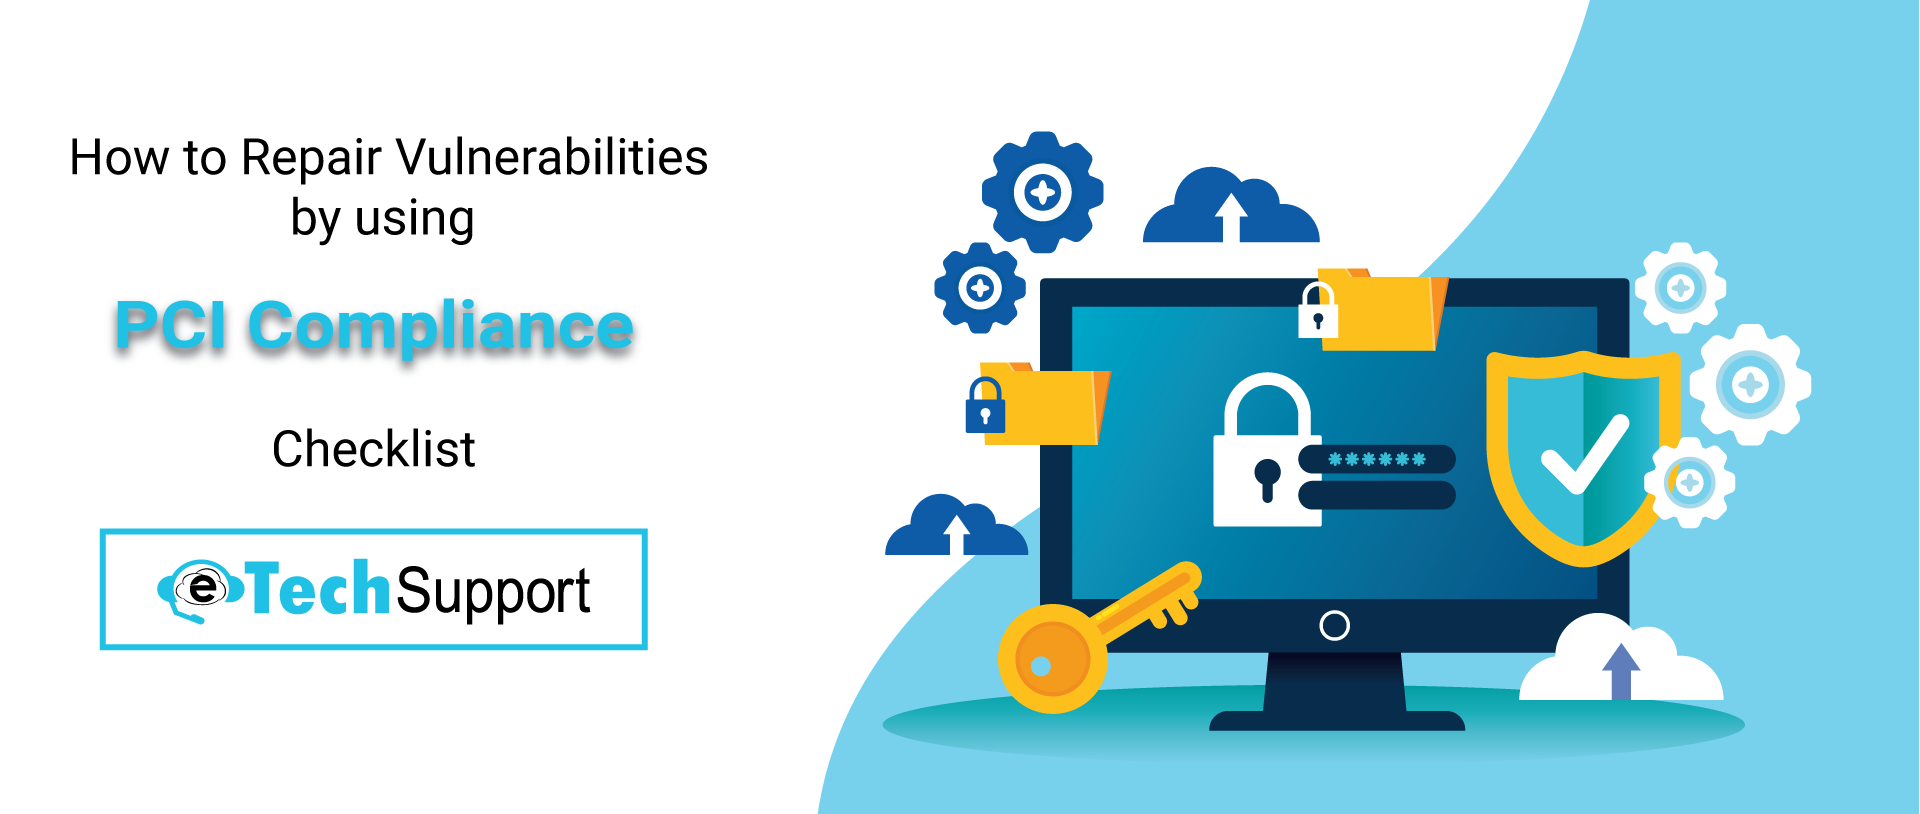 Repair-Vulnerabilities-By-using-PCI-Compliance-Checklist